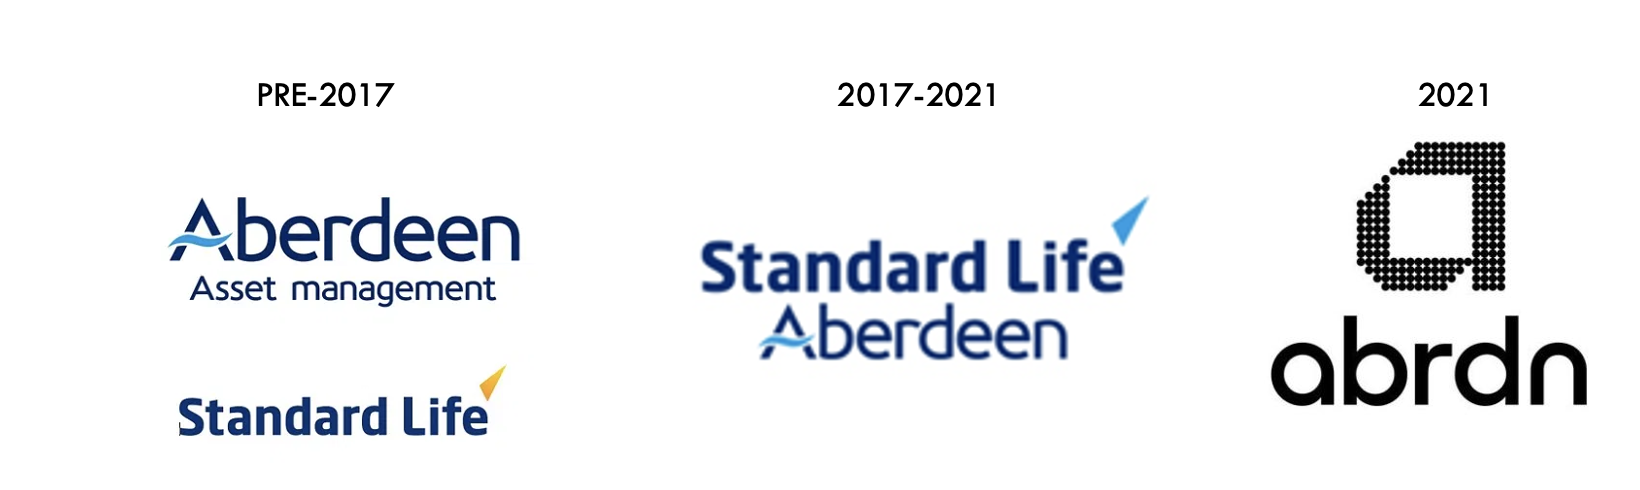 Logo changes